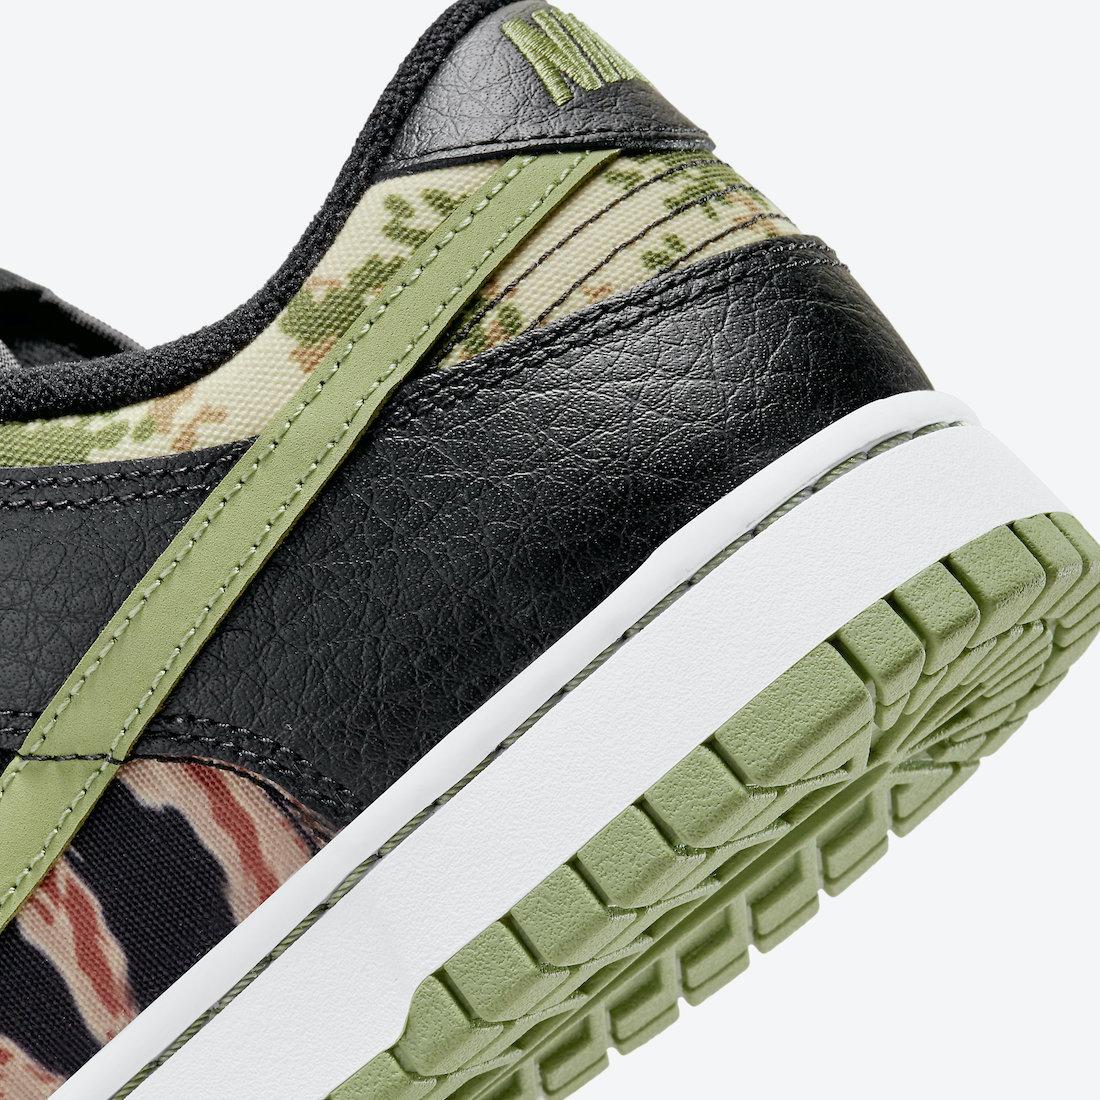 Nike-Dunk-Low-Black-Multi-Camo-DH0957-001-Release-Date-7